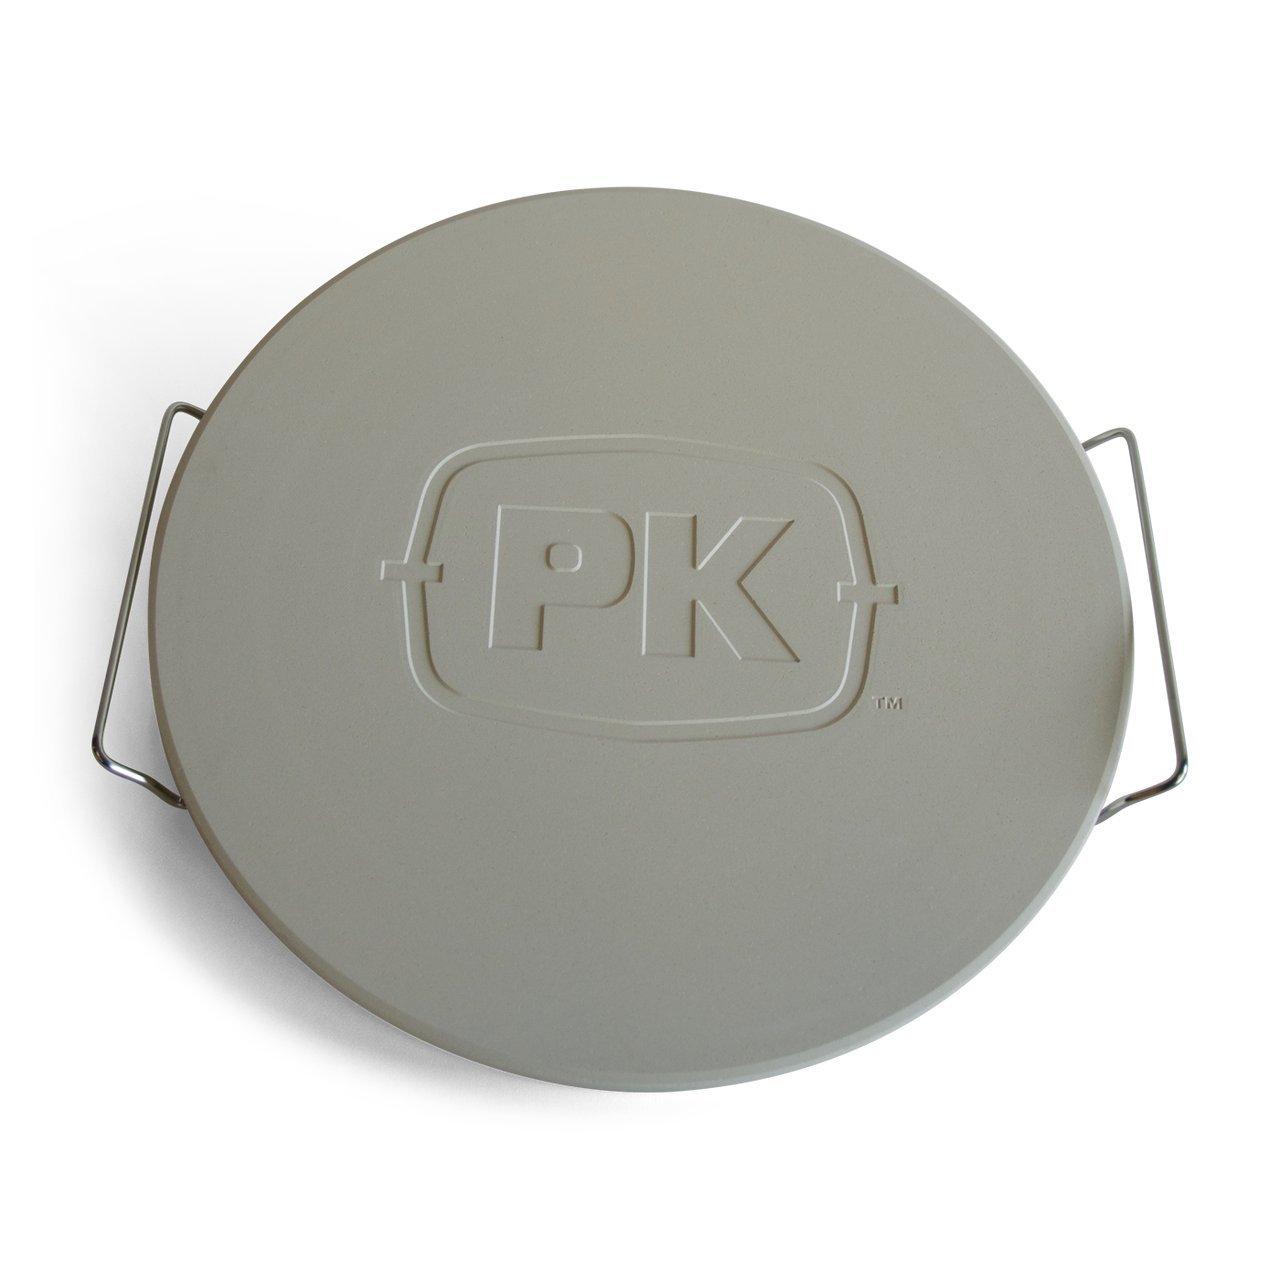 PK Grills PK99070 Round Ceramic Pizza Stone by PK Grills